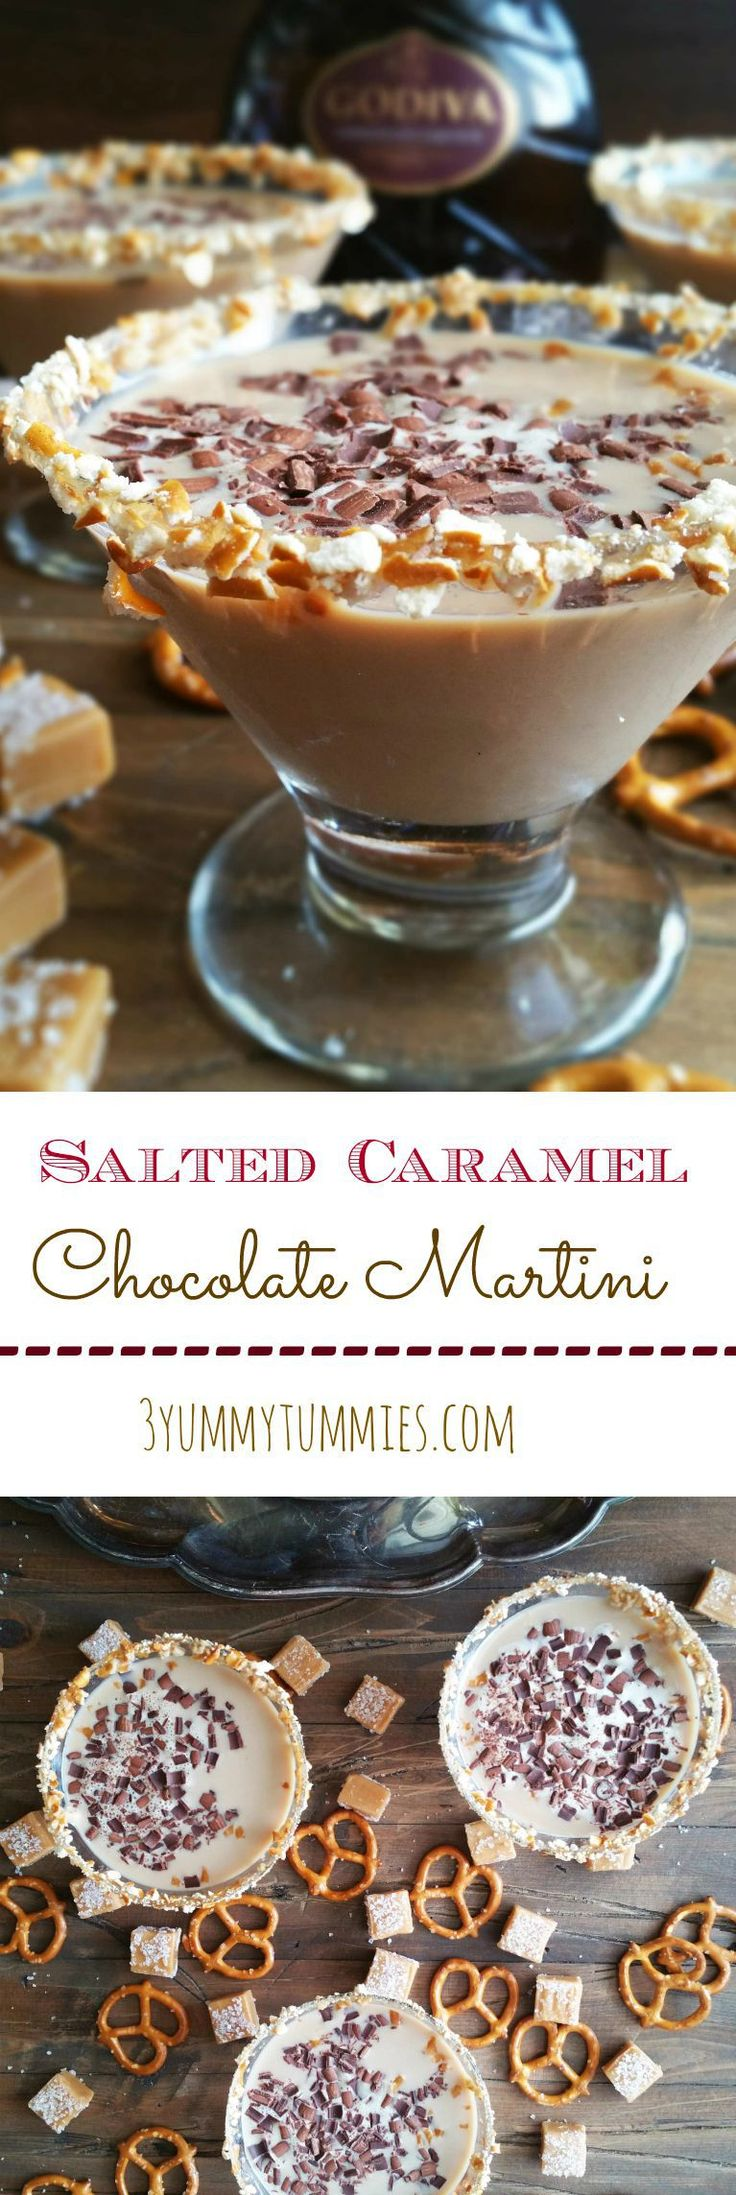 best 25+ salted caramel vodka ideas on pinterest | salted caramel